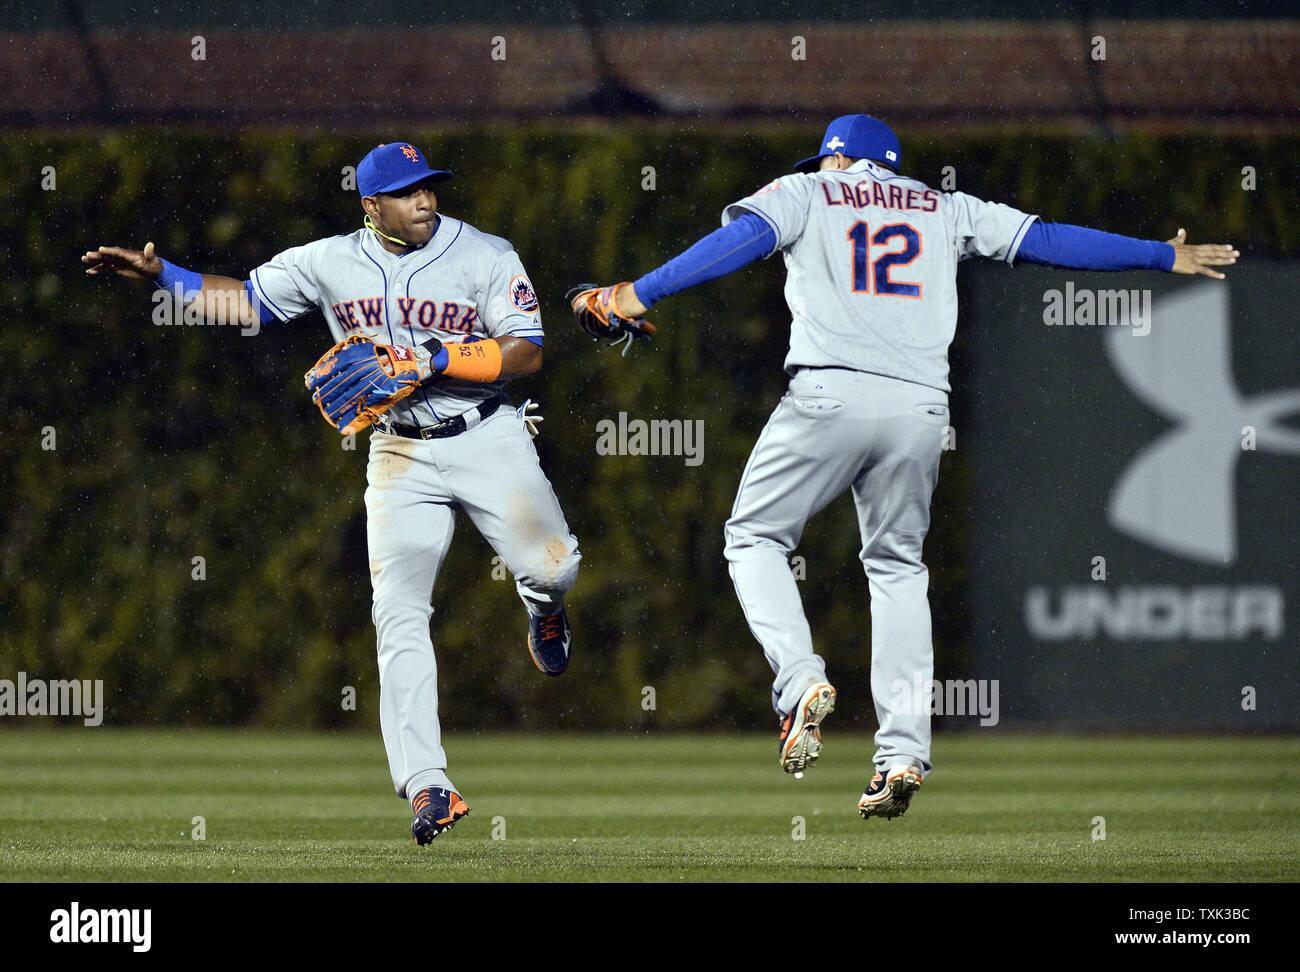 New York Mets center fielder Yoenis Cespedes (L) and center